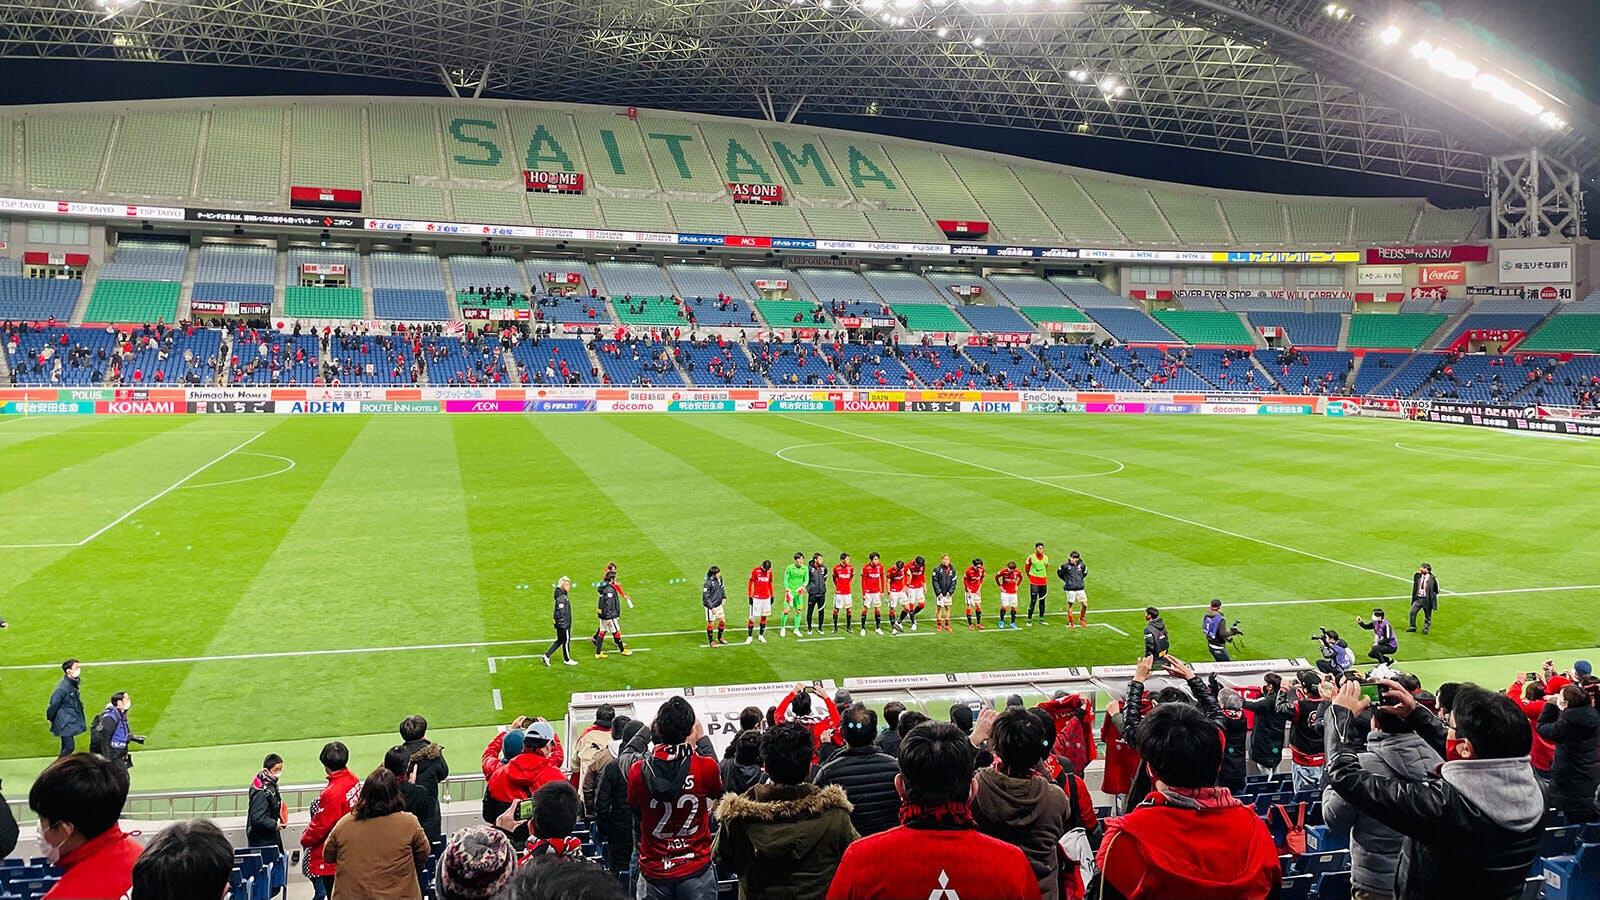 2021 Jリーグ 第3節 埼玉スタジアム2002 横浜FC戦 試合後